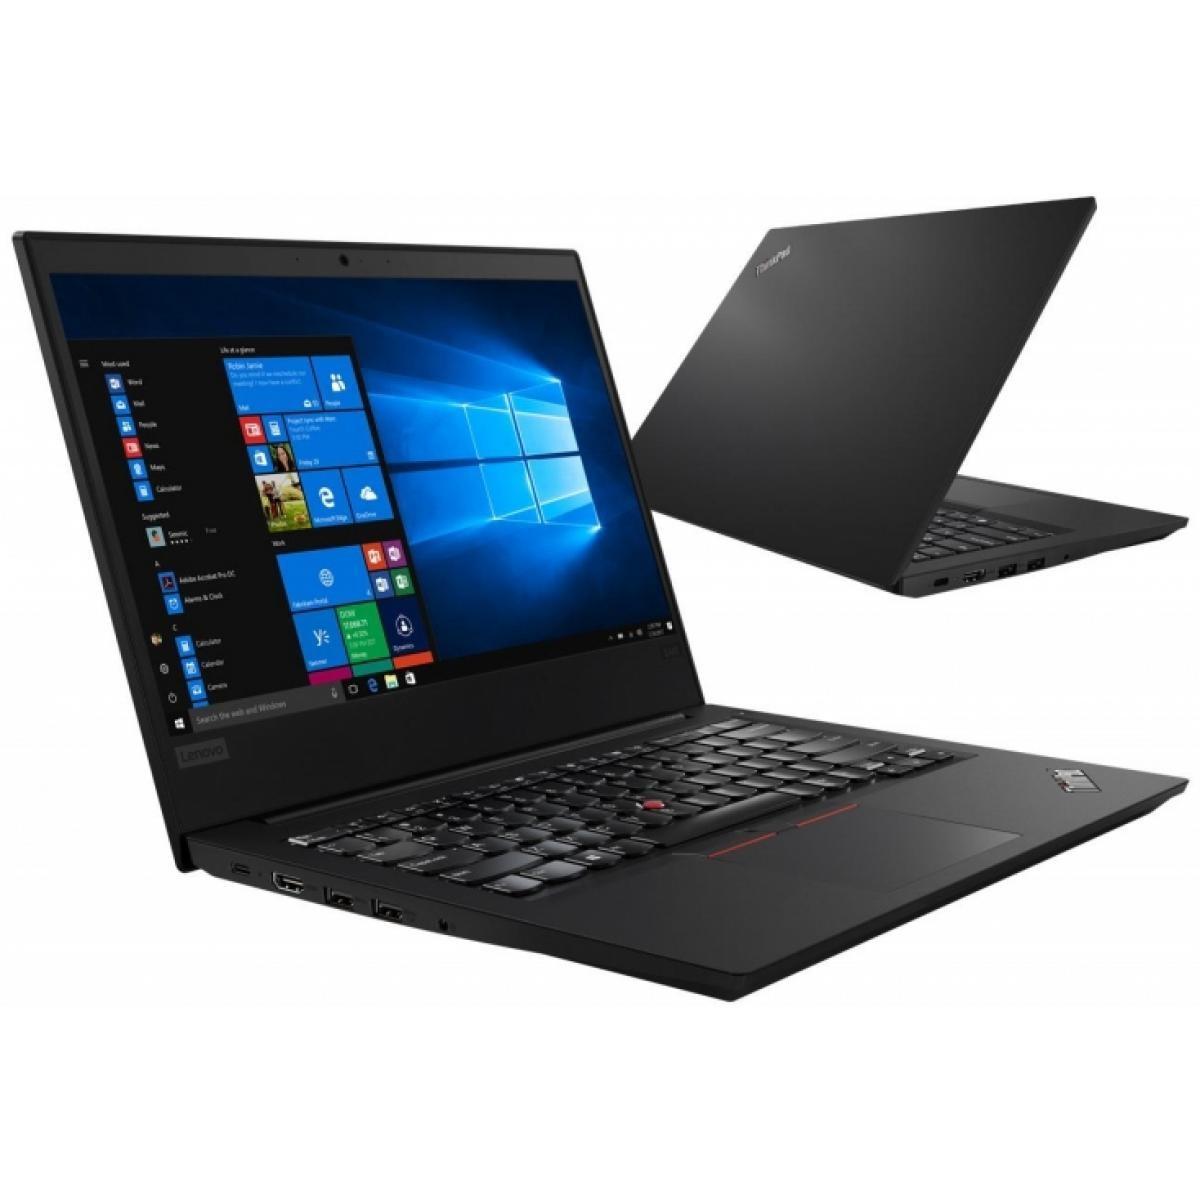 Lenovo ThinkPad E490s (20NGS01K00) | i5-8265U | 8GB DDR4 | SSD 256GB | VGA Onboard | 14.0 FHD | FreeDos >>> Deal giá mua, Trả góp 0%